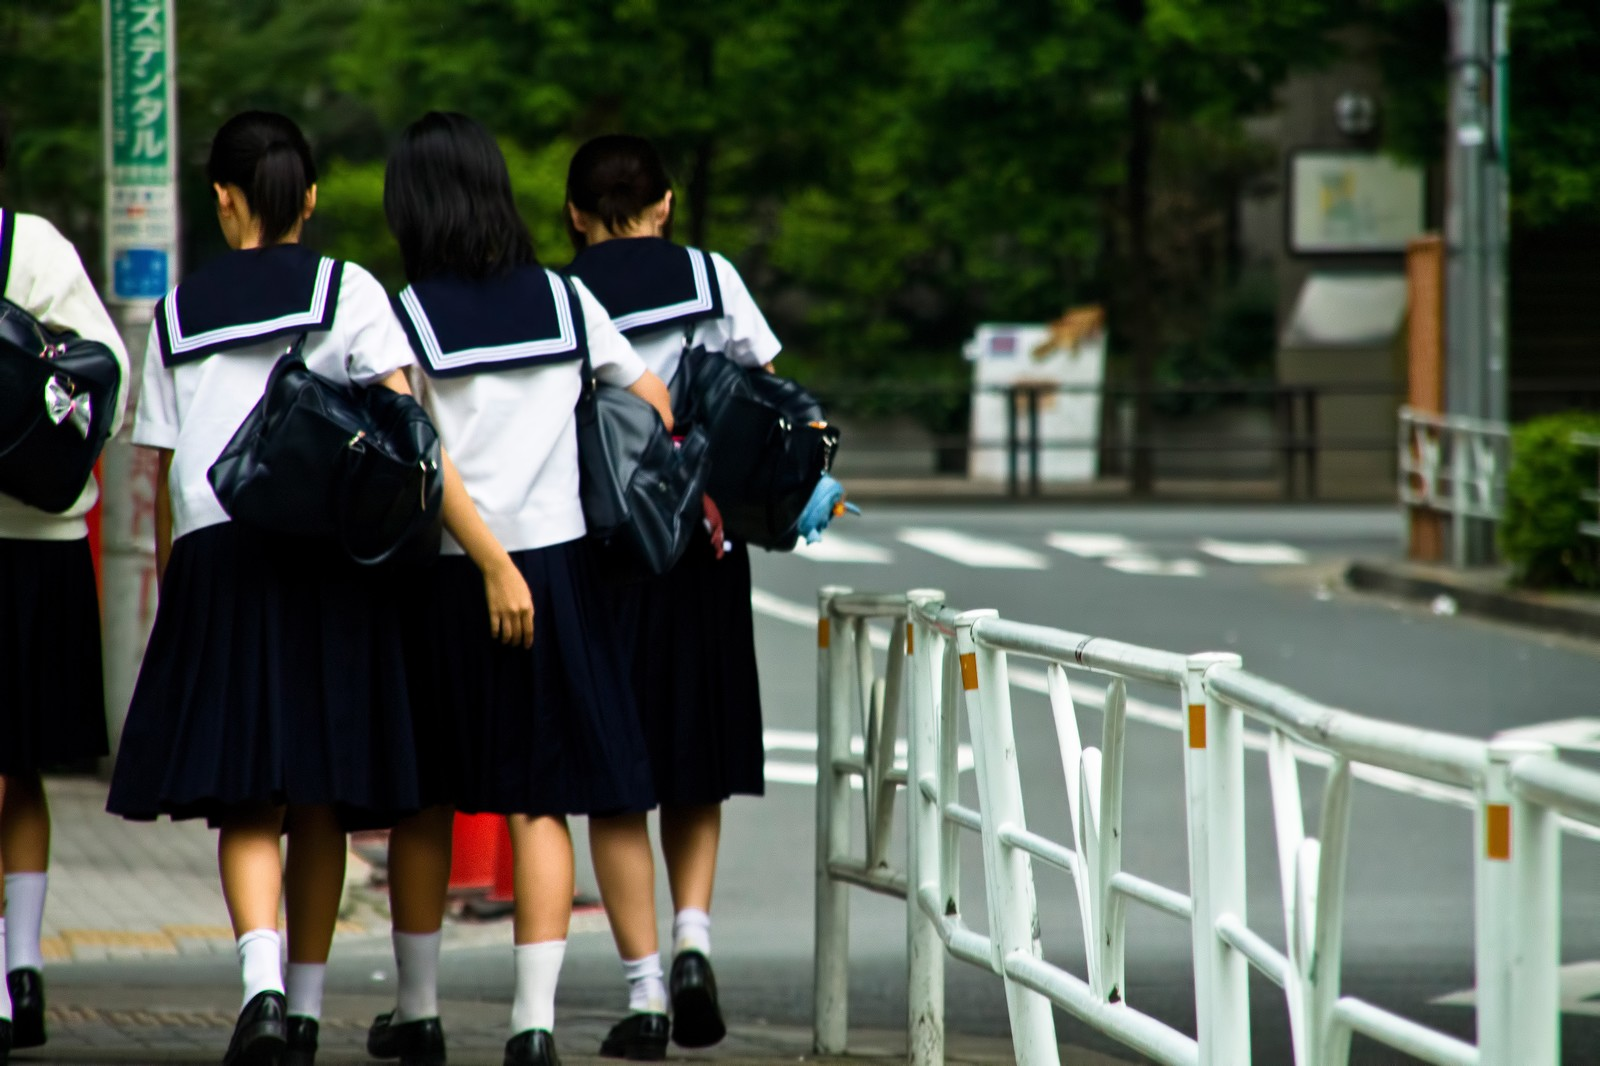 「下校中の女子中学生」の写真